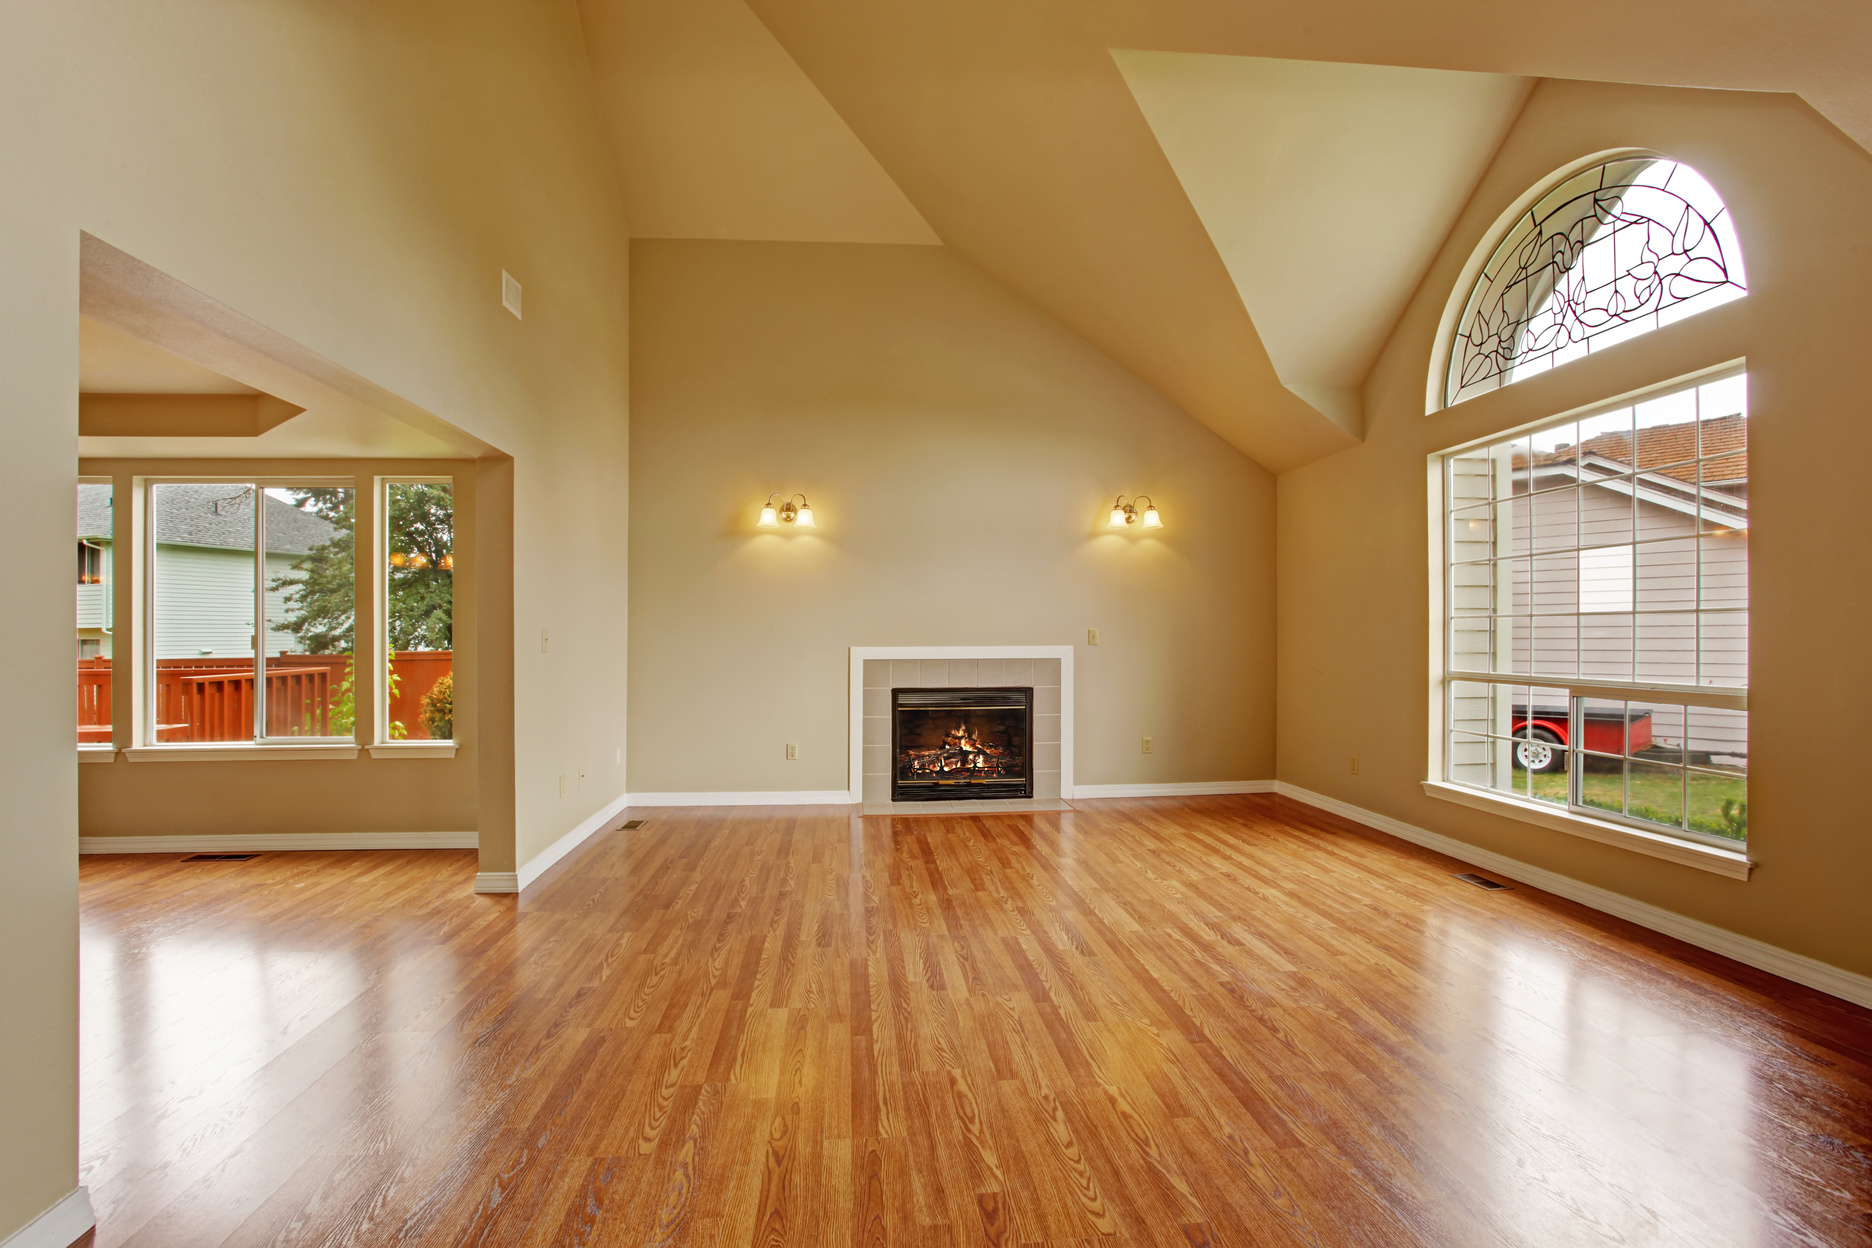 042536936-empty-living-room-high-ceiling.jpeg